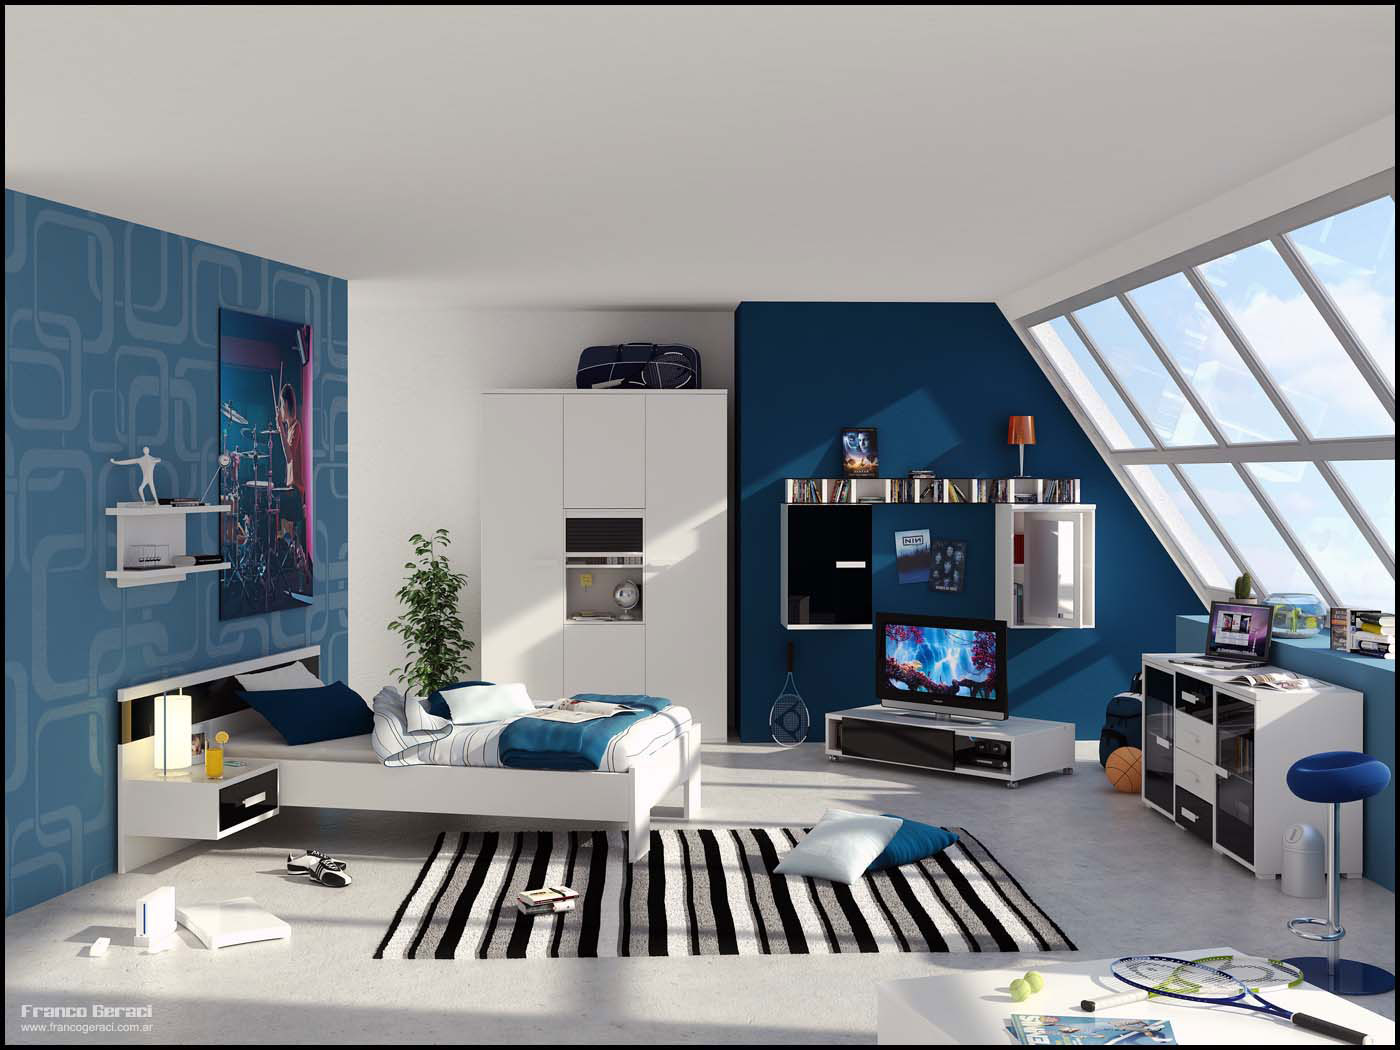 a blue room with outside views - Интерьер юношеской комнаты